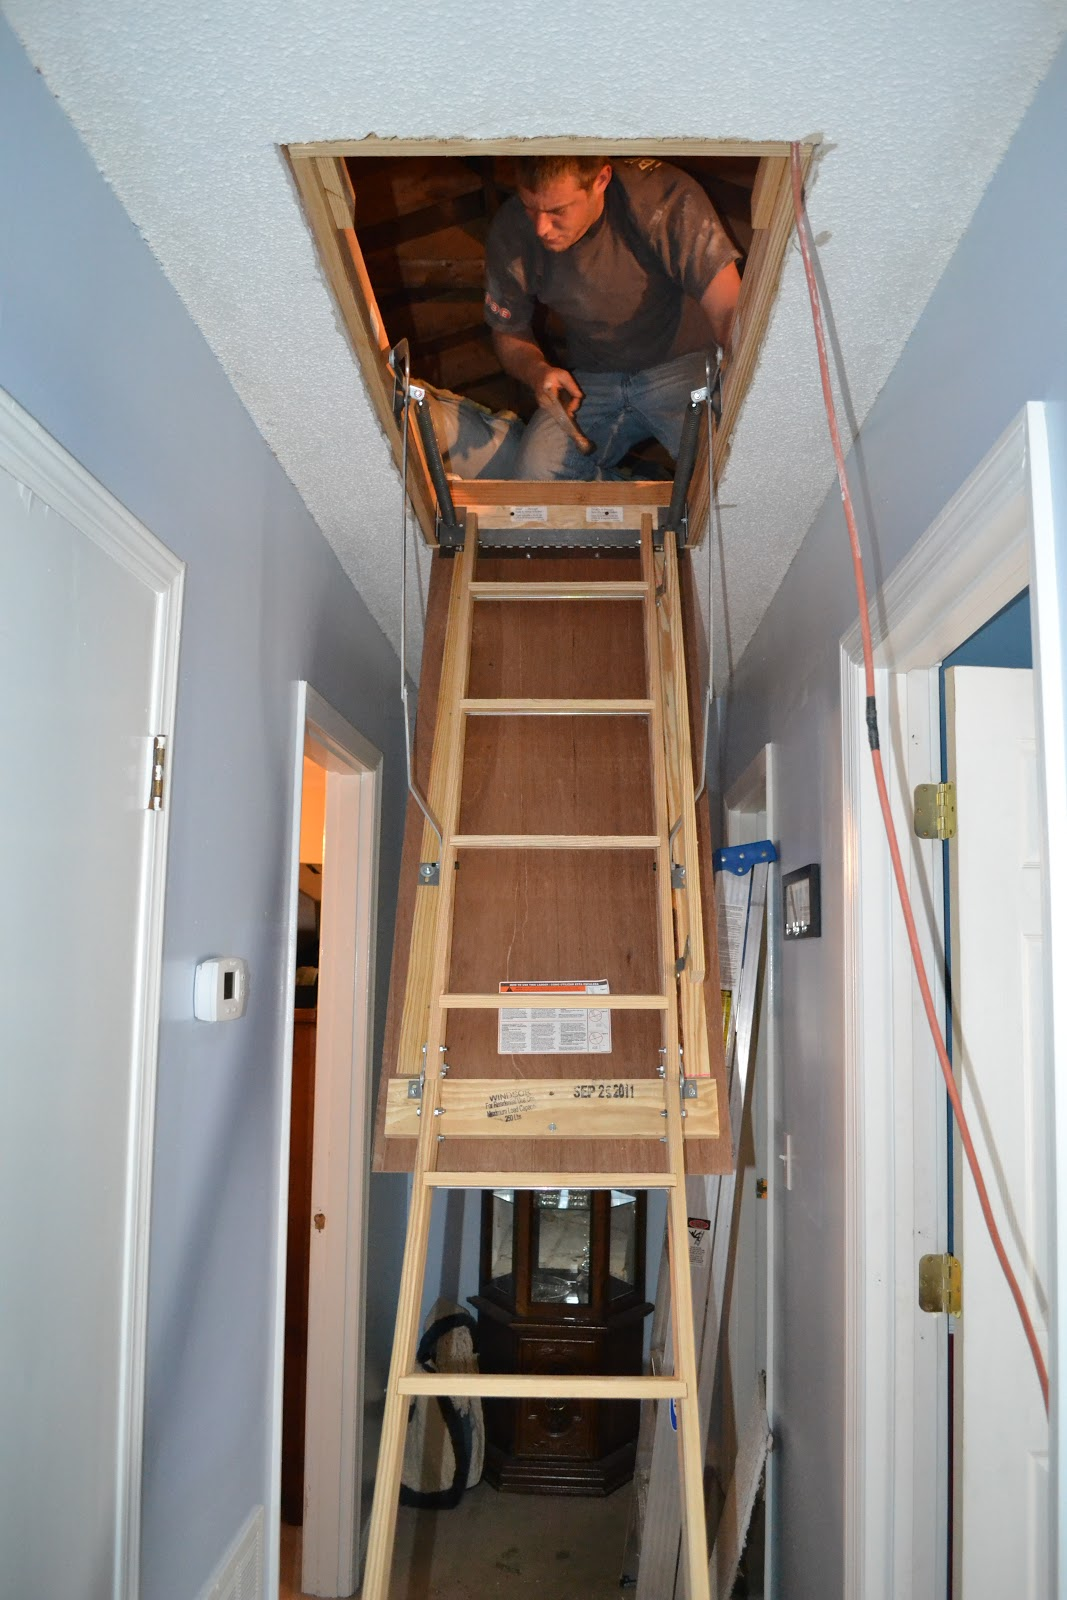 Download Install Attic Ladder Free Backuplite